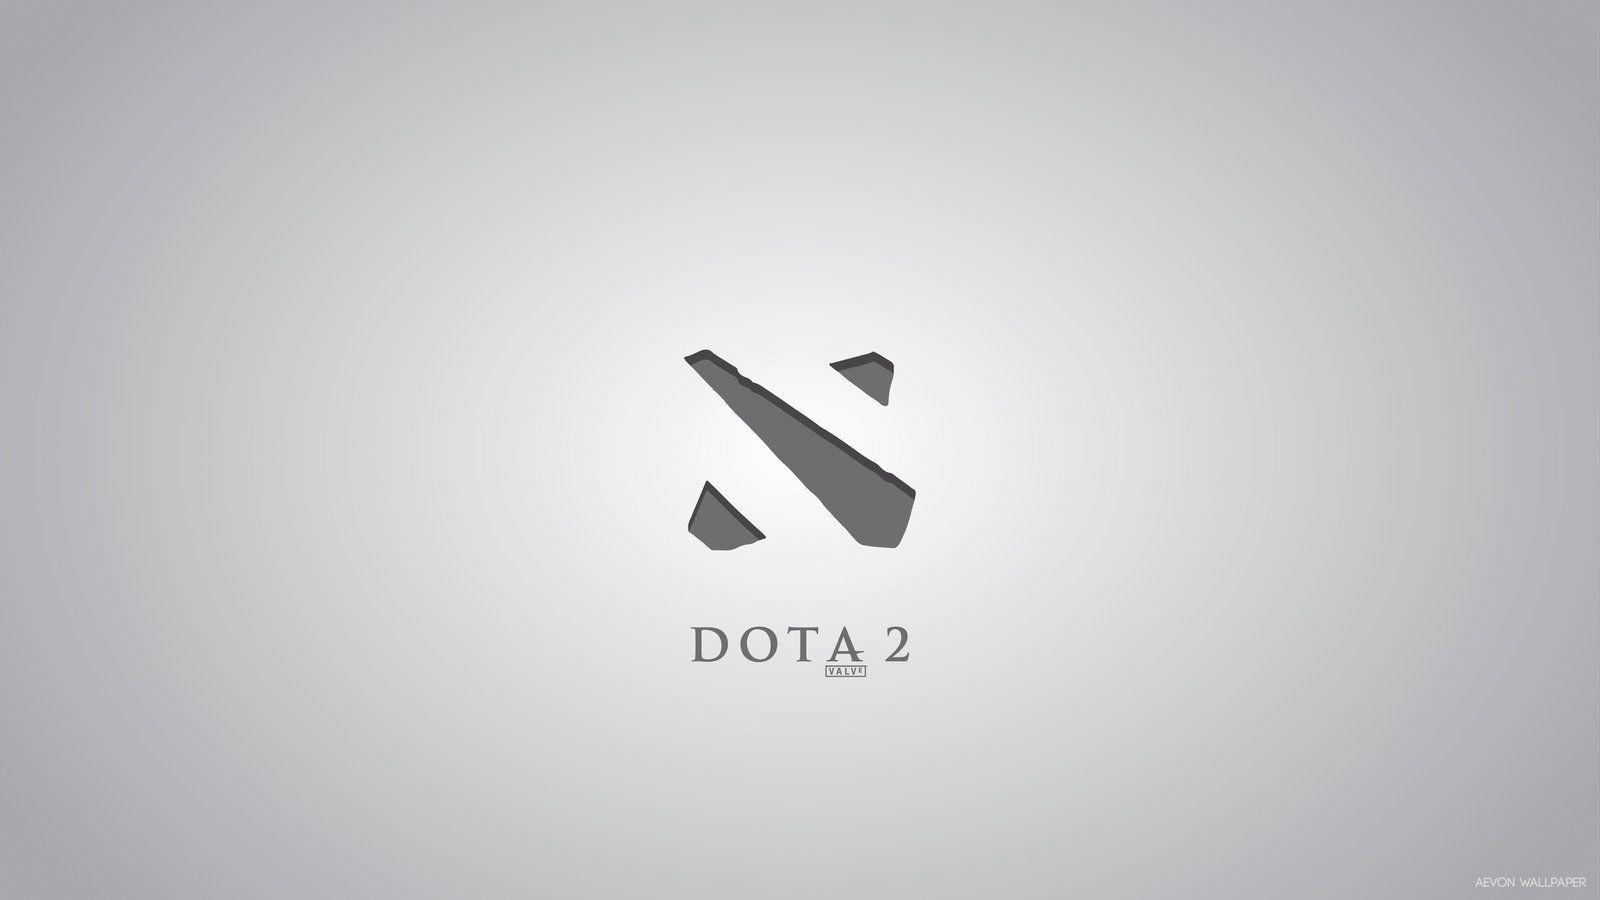 dota 2 logo backgrounds as wallpaper hd hahahaha in 2018